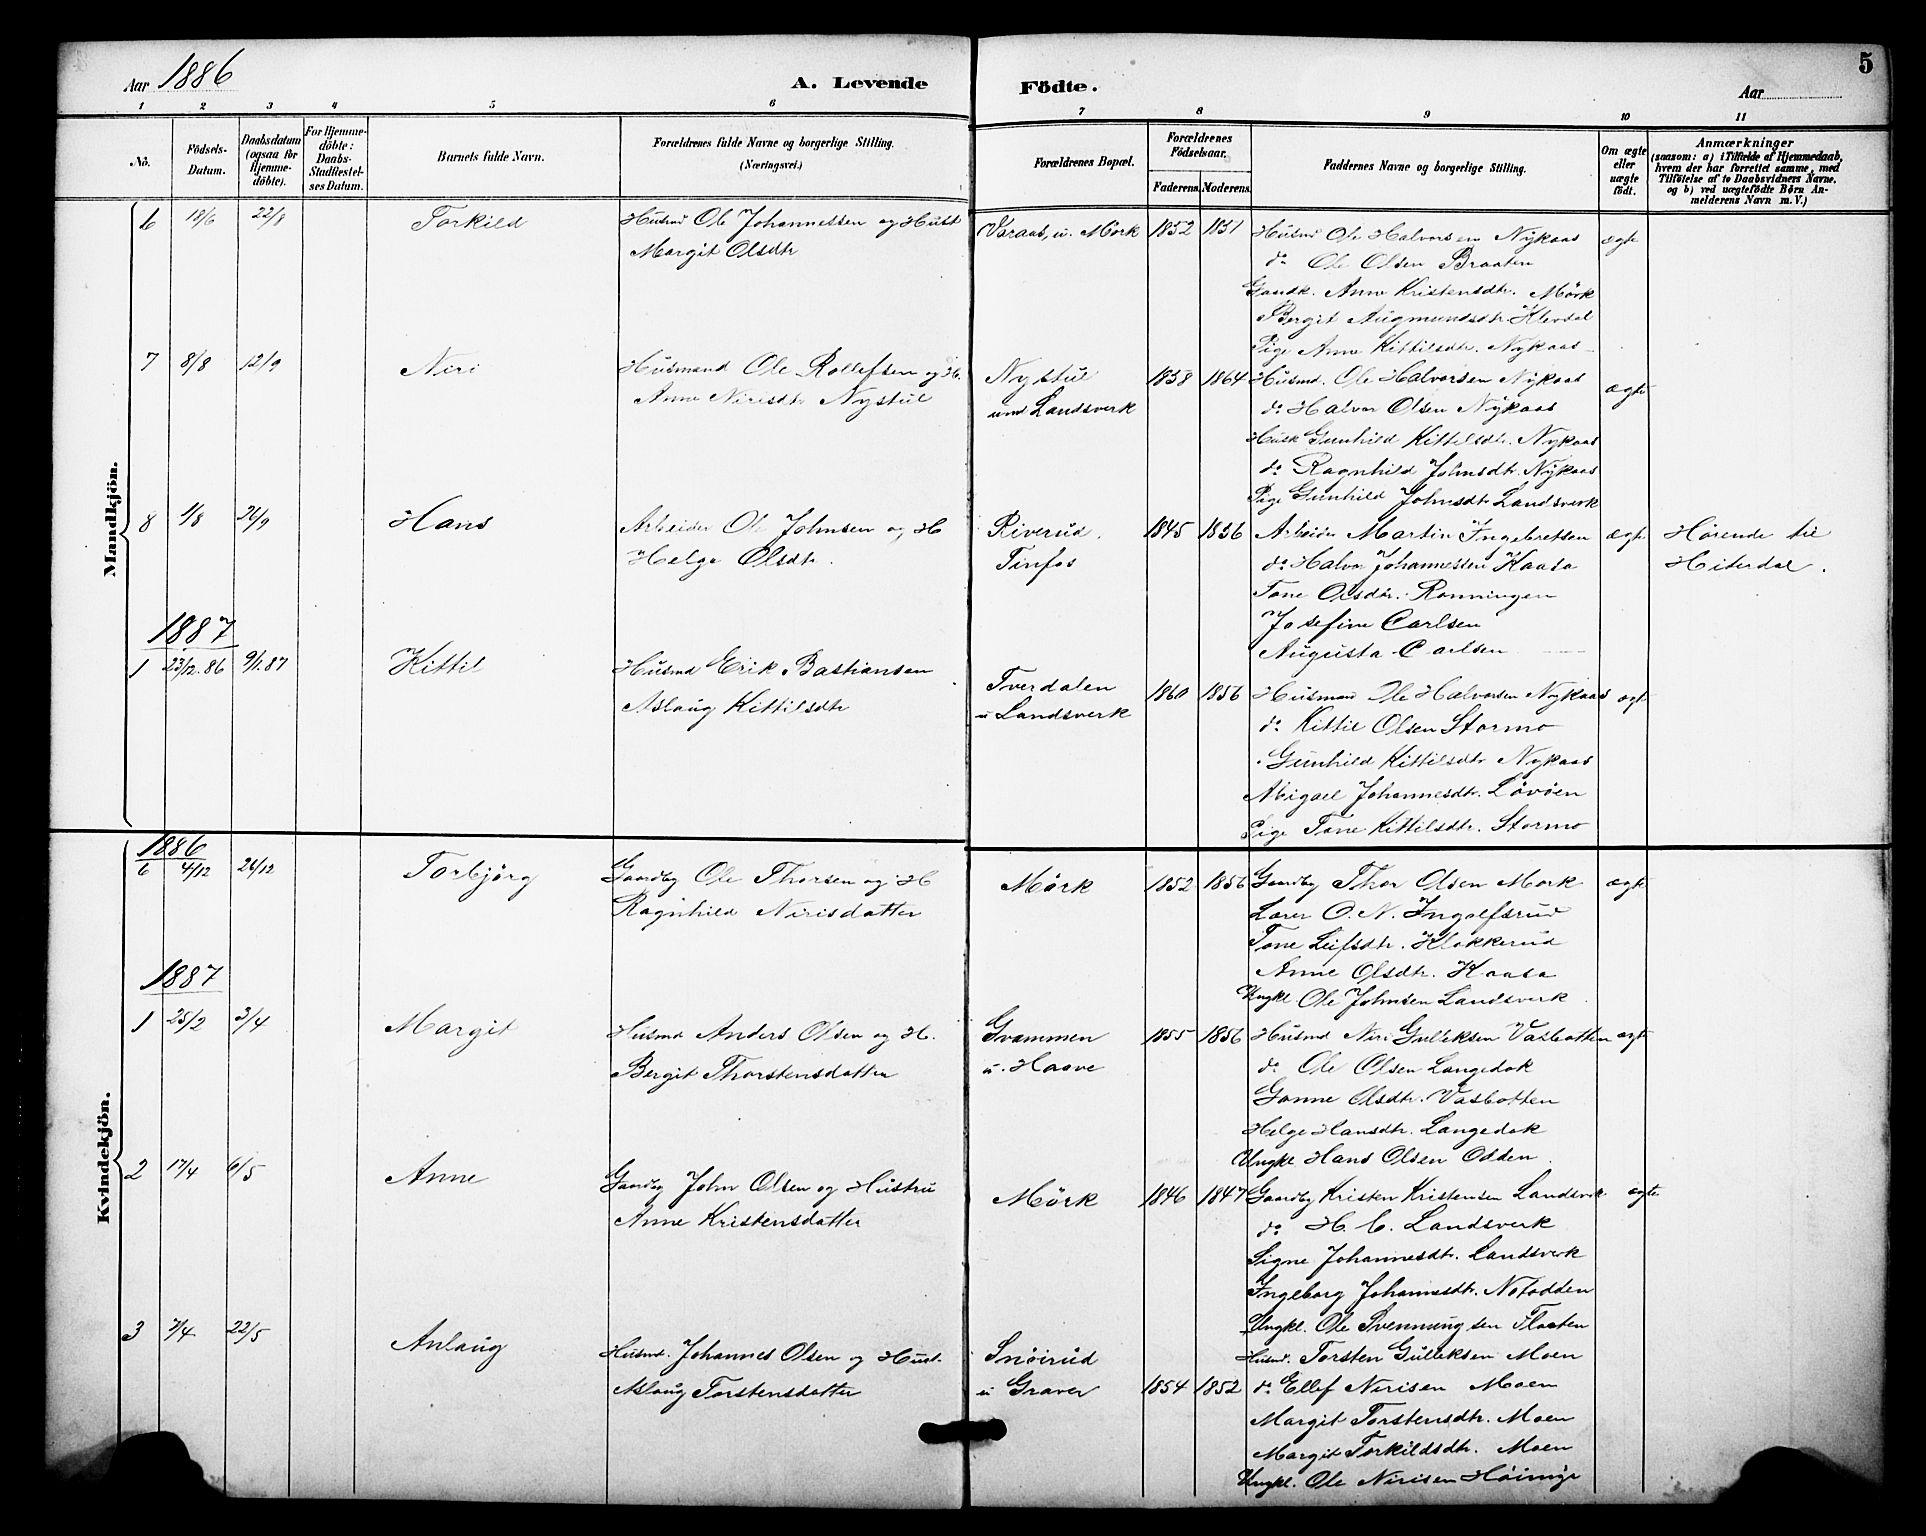 SAKO, Heddal kirkebøker, F/Fb/L0001: Ministerialbok nr. II 1, 1884-1910, s. 5